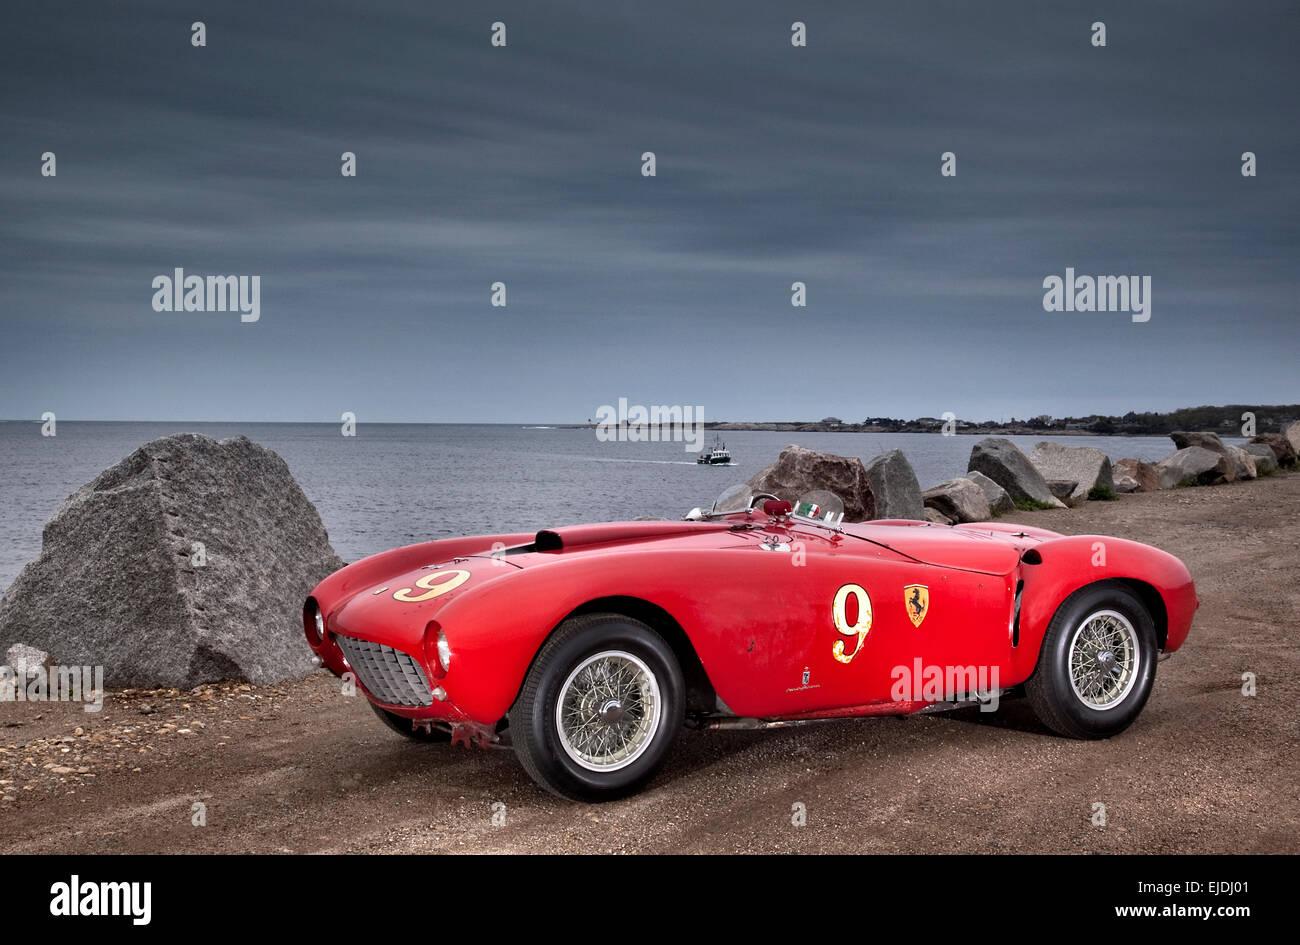 1953 Ferrari 375 MM Pinin Farina Spider sports racing car Imagen De Stock